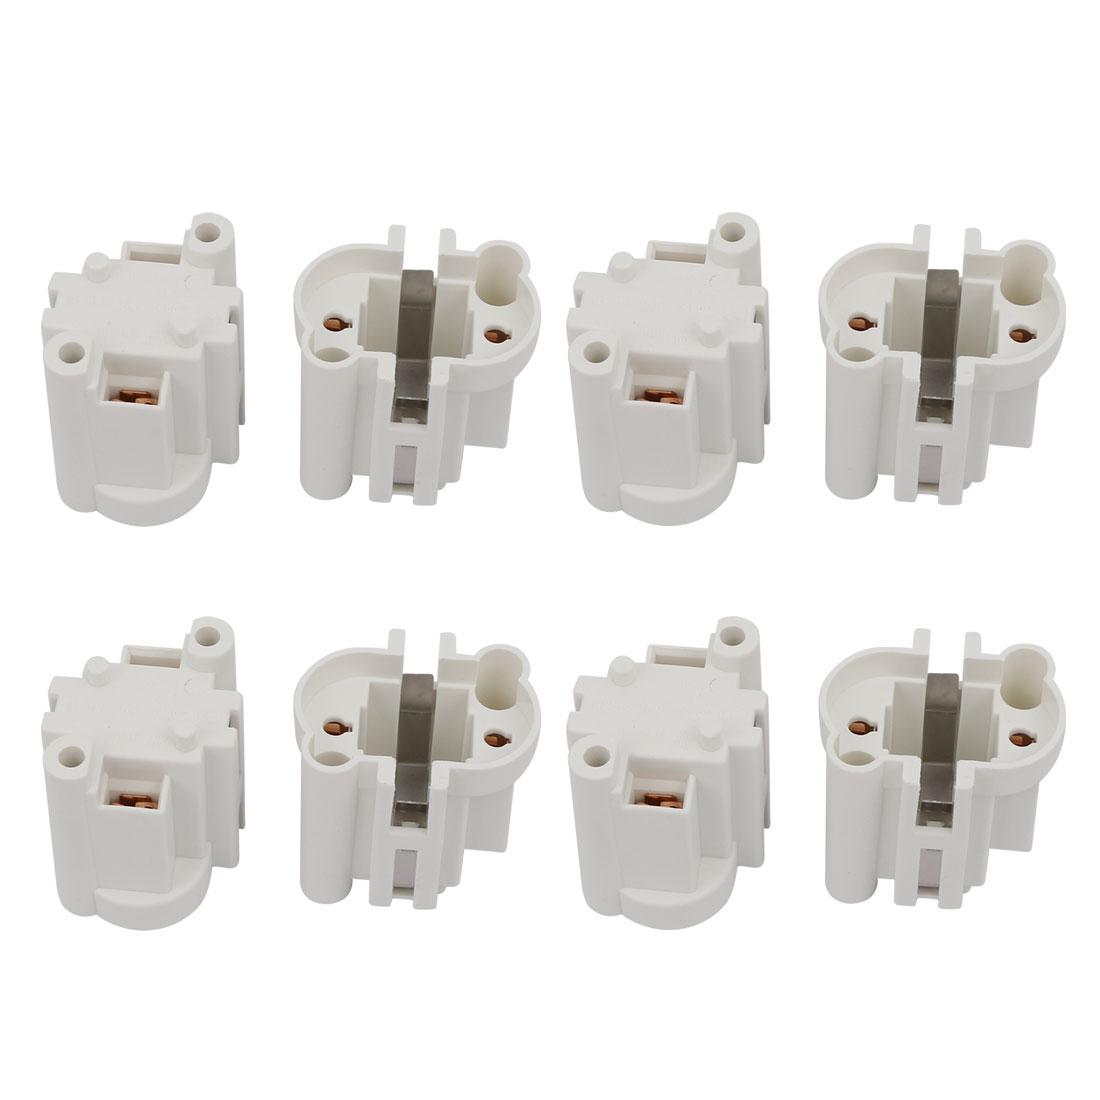 8 Pcs G23-F269 AC 500V 2A Light Socket Base Fluorescent PL Tube Lamp Holder